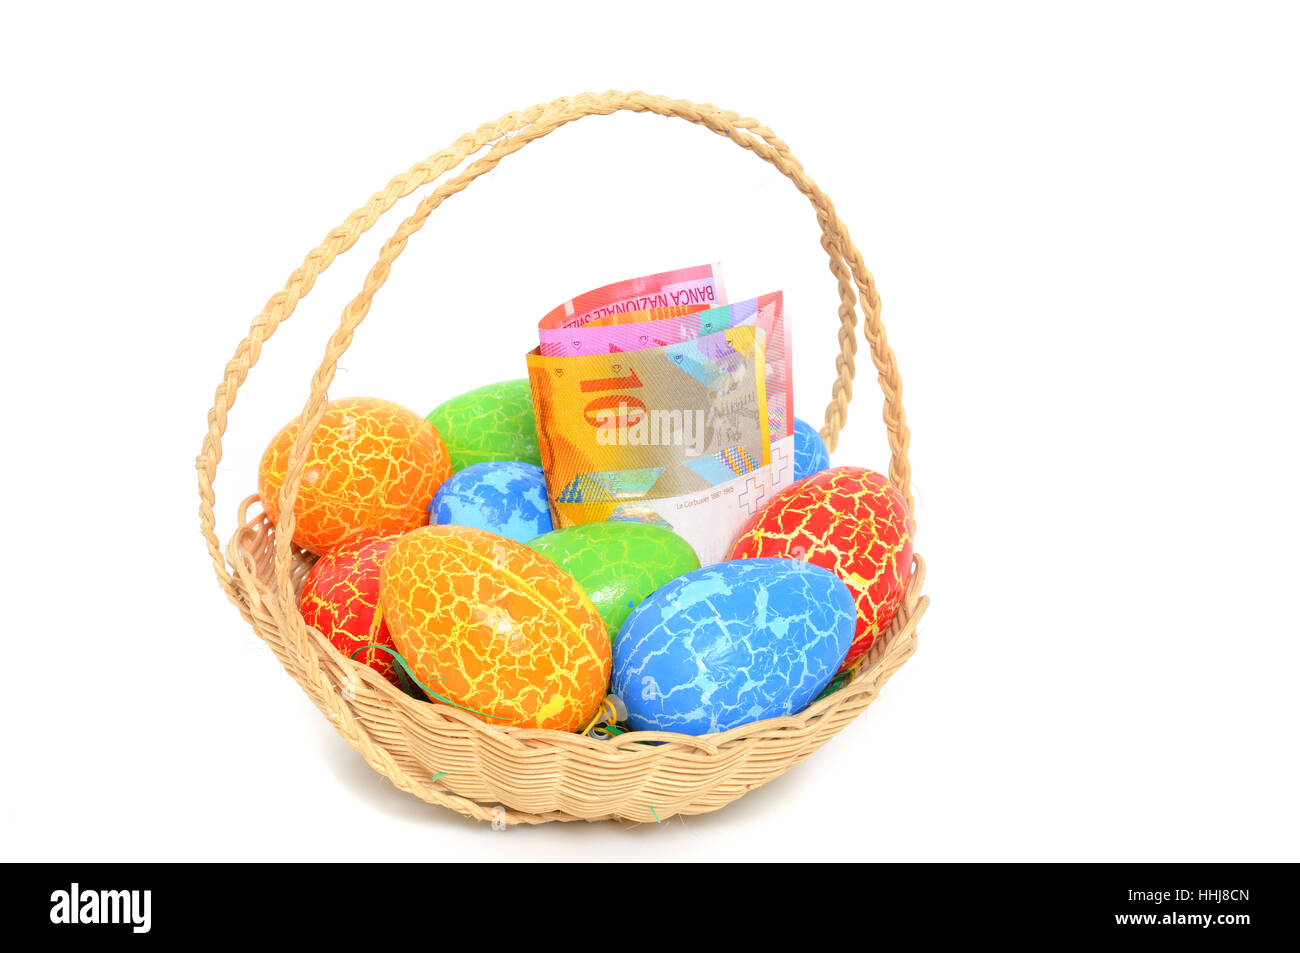 Easter eggs swiss money francs studio photography basket stock easter eggs swiss money francs studio photography basket easter gift negle Images